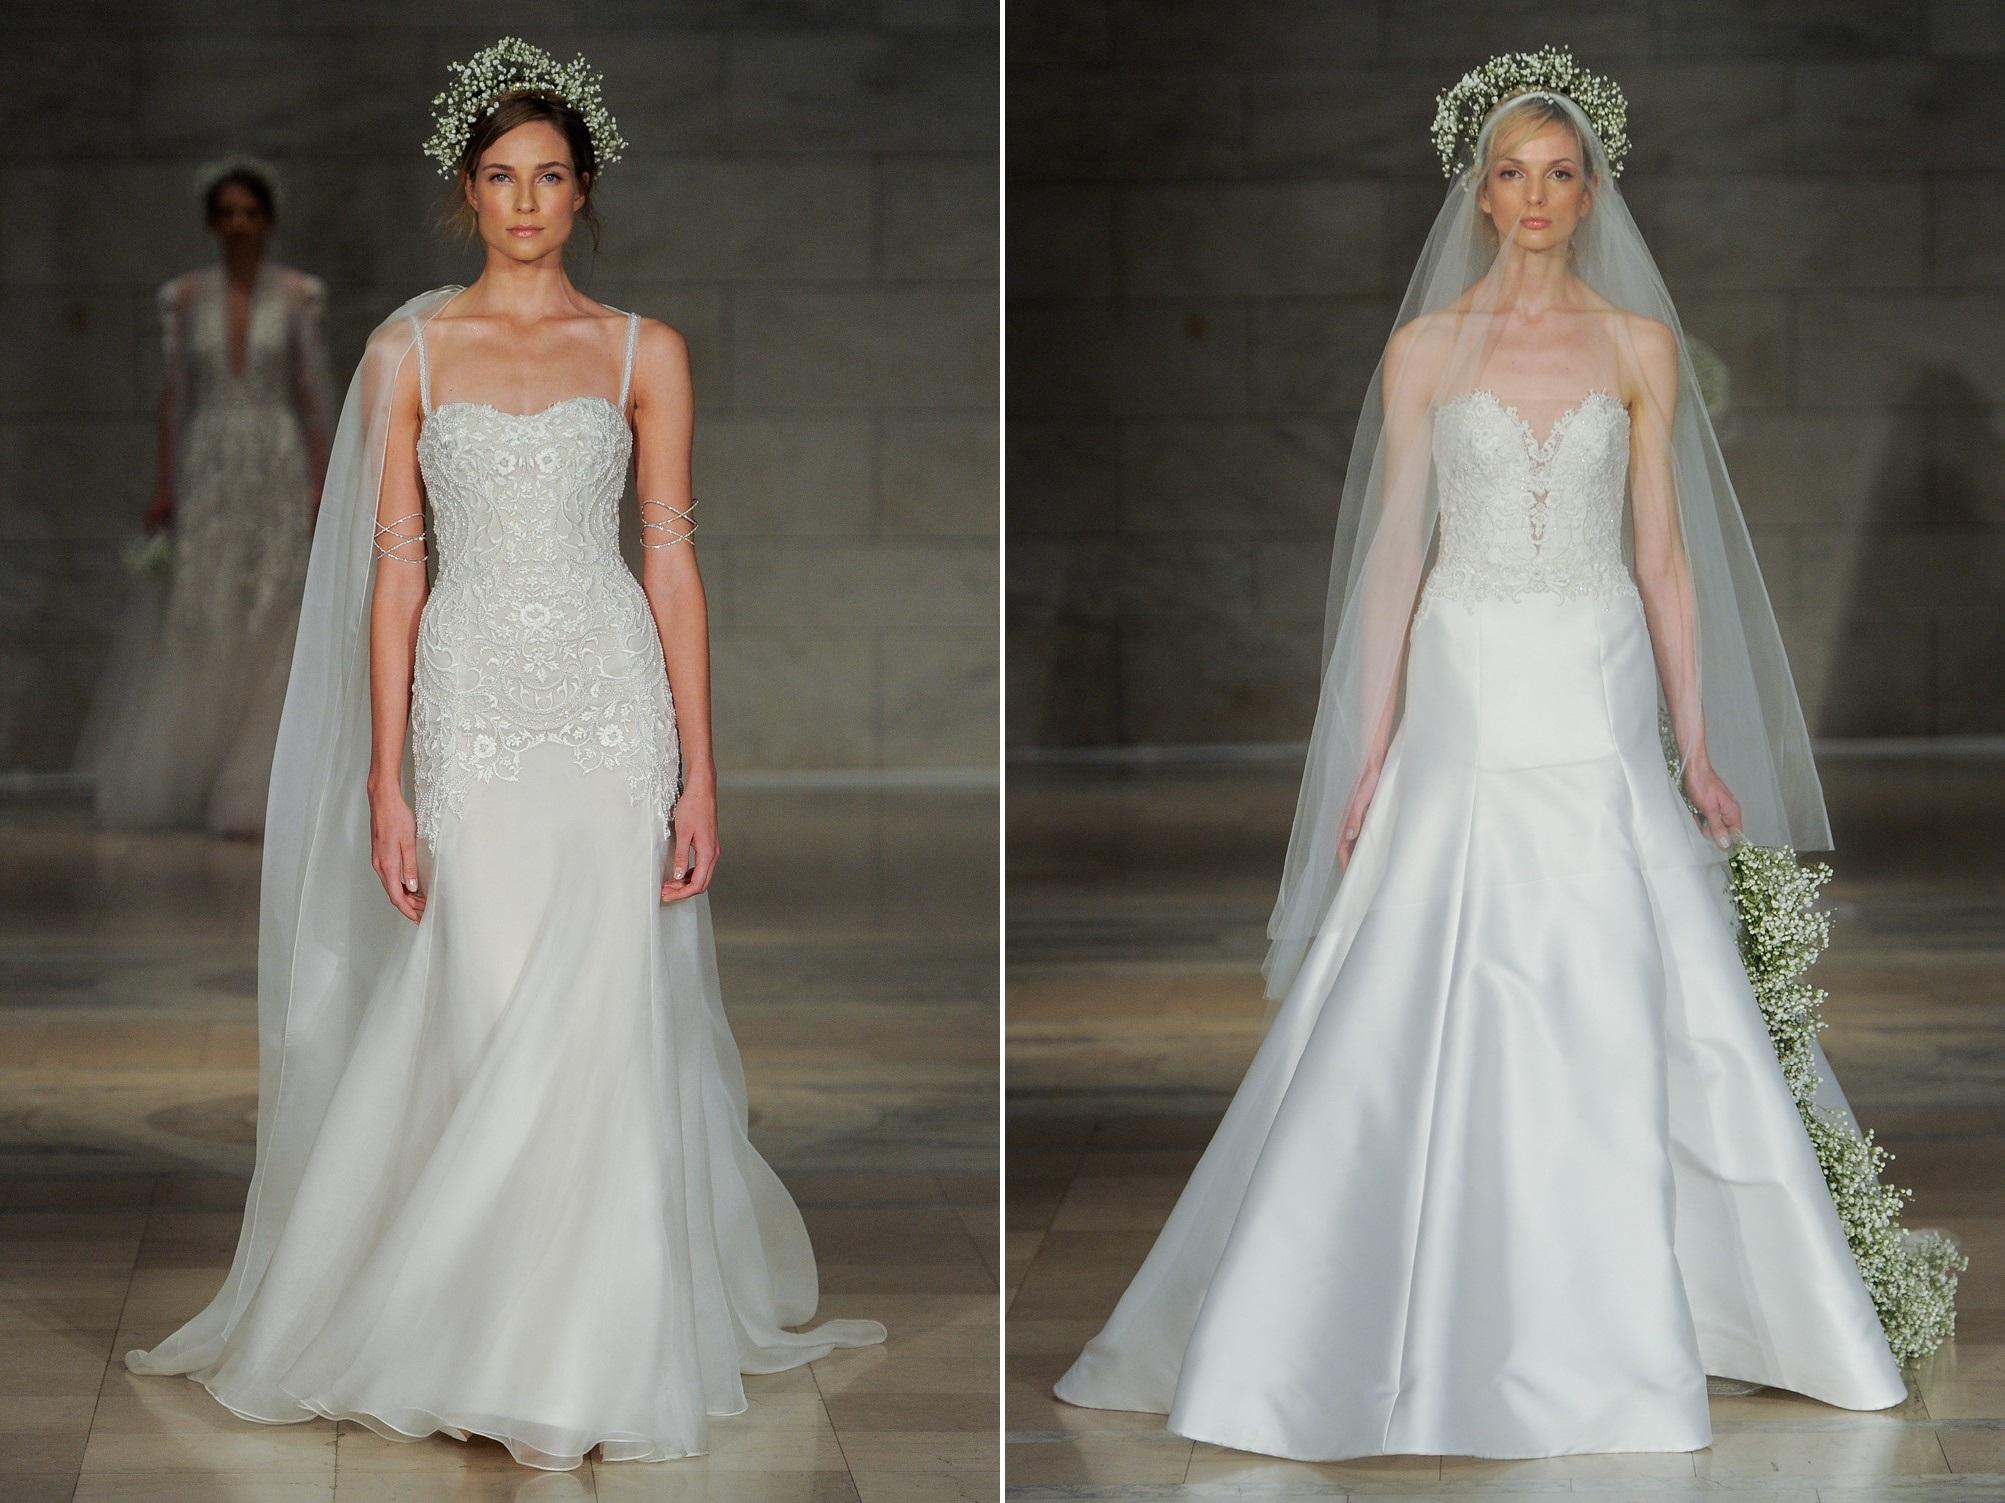 Reem Acra's 2018 Wedding Dress Collection